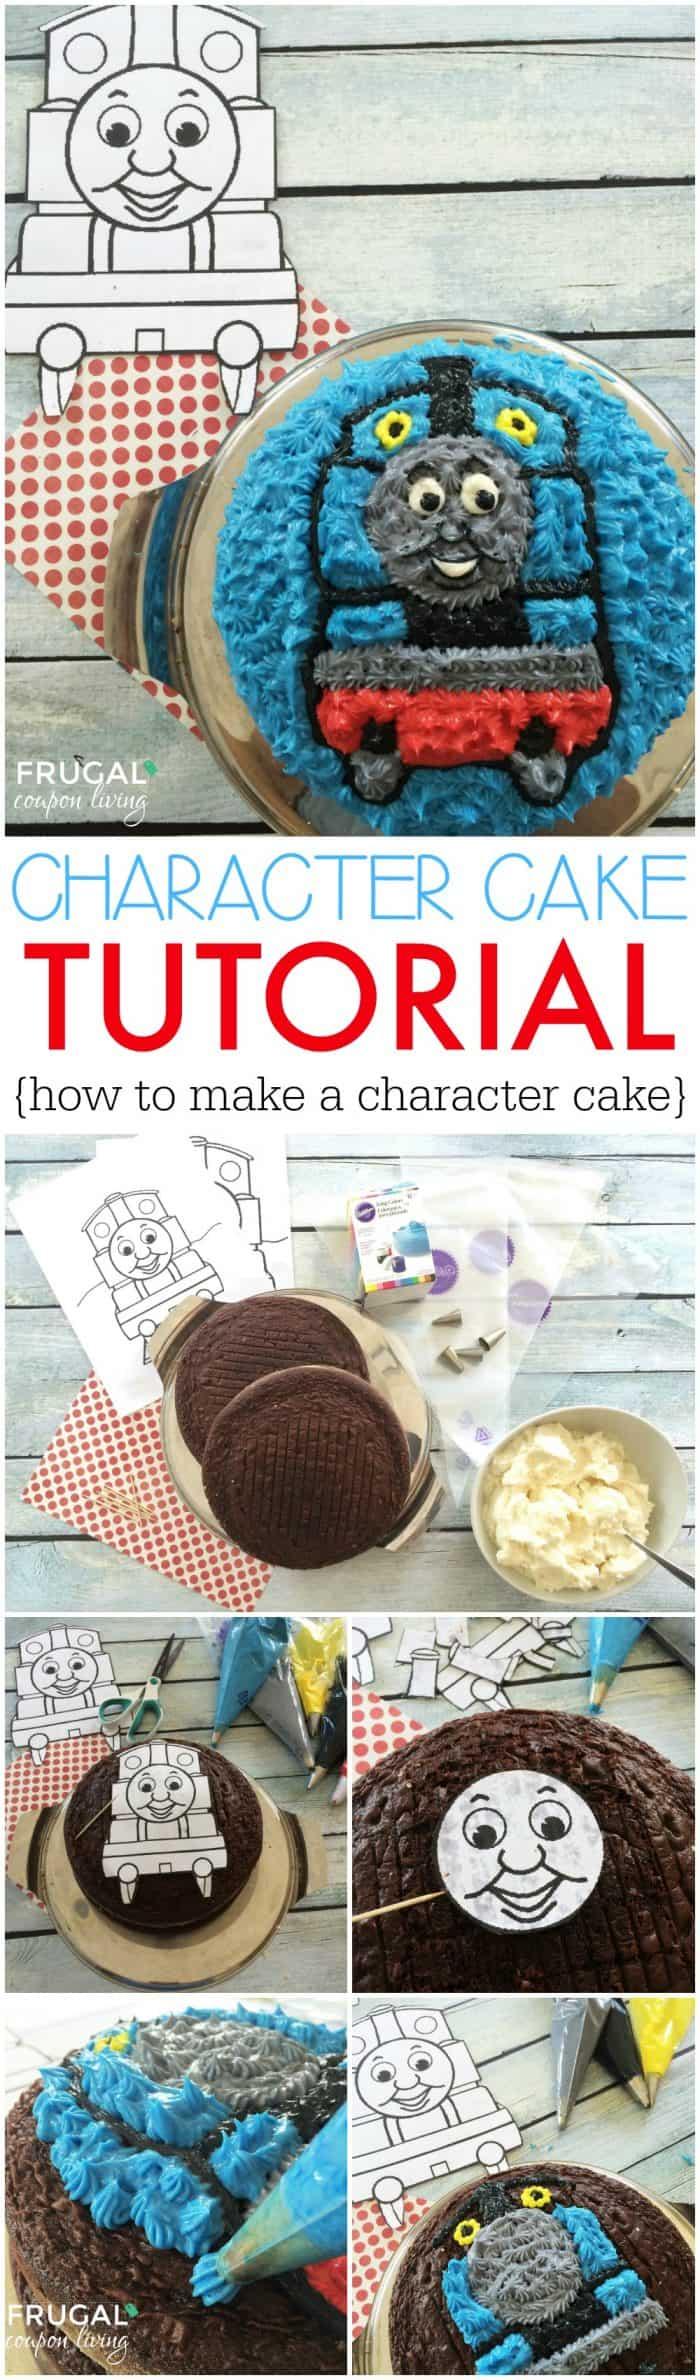 Character Cake Tutorial - Easy Thomas the Train Cake